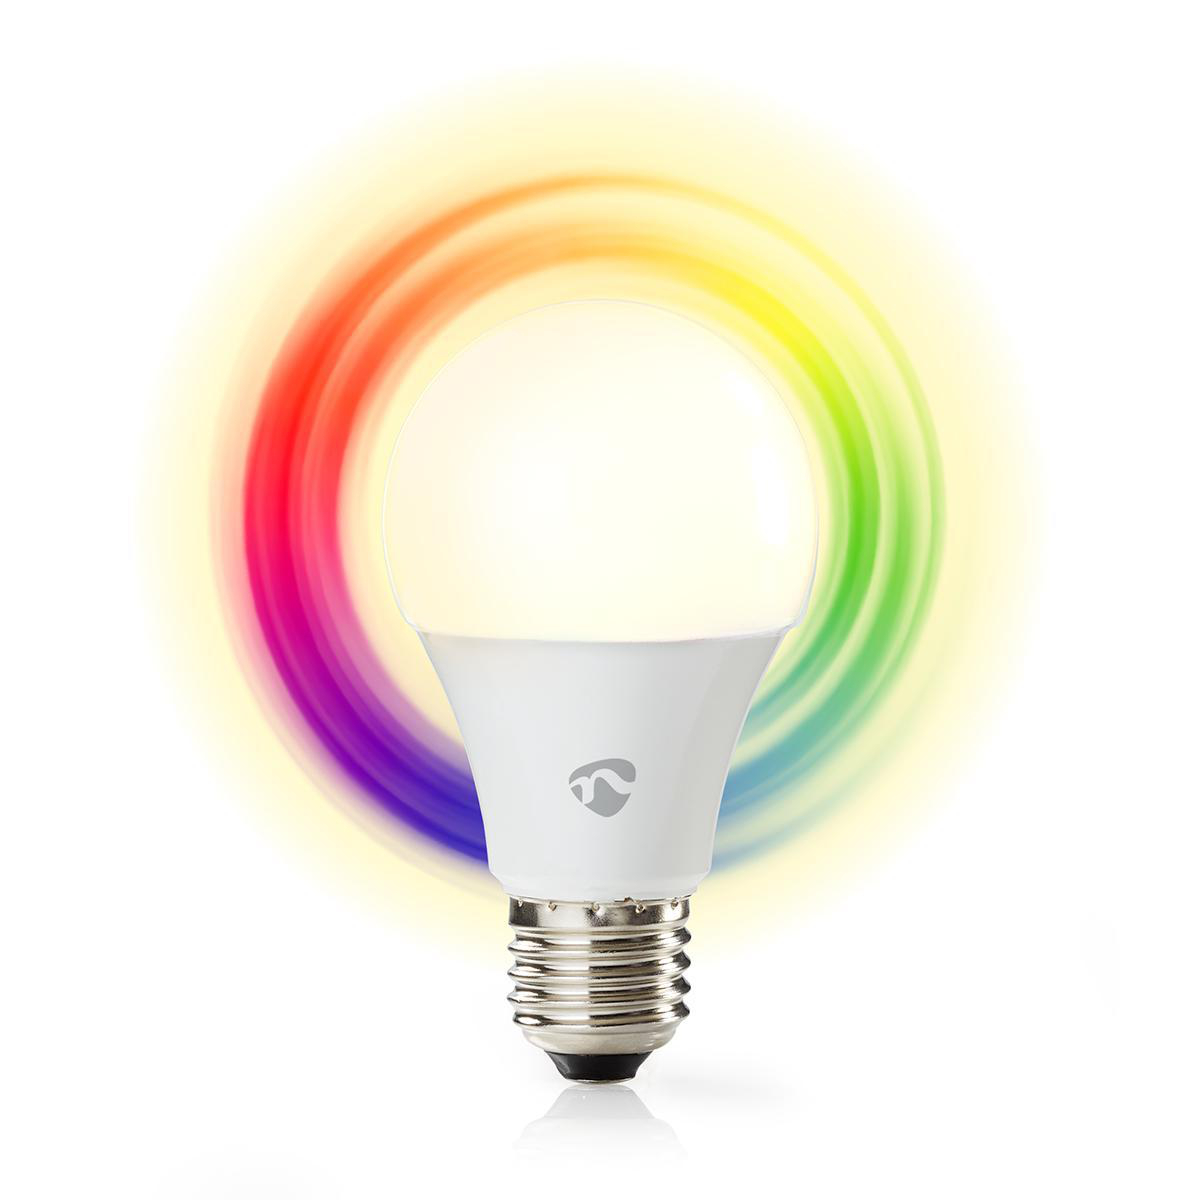 WLAN Smart LED Lampe | Vollfarbig und warmweiß | E27 | Nedis